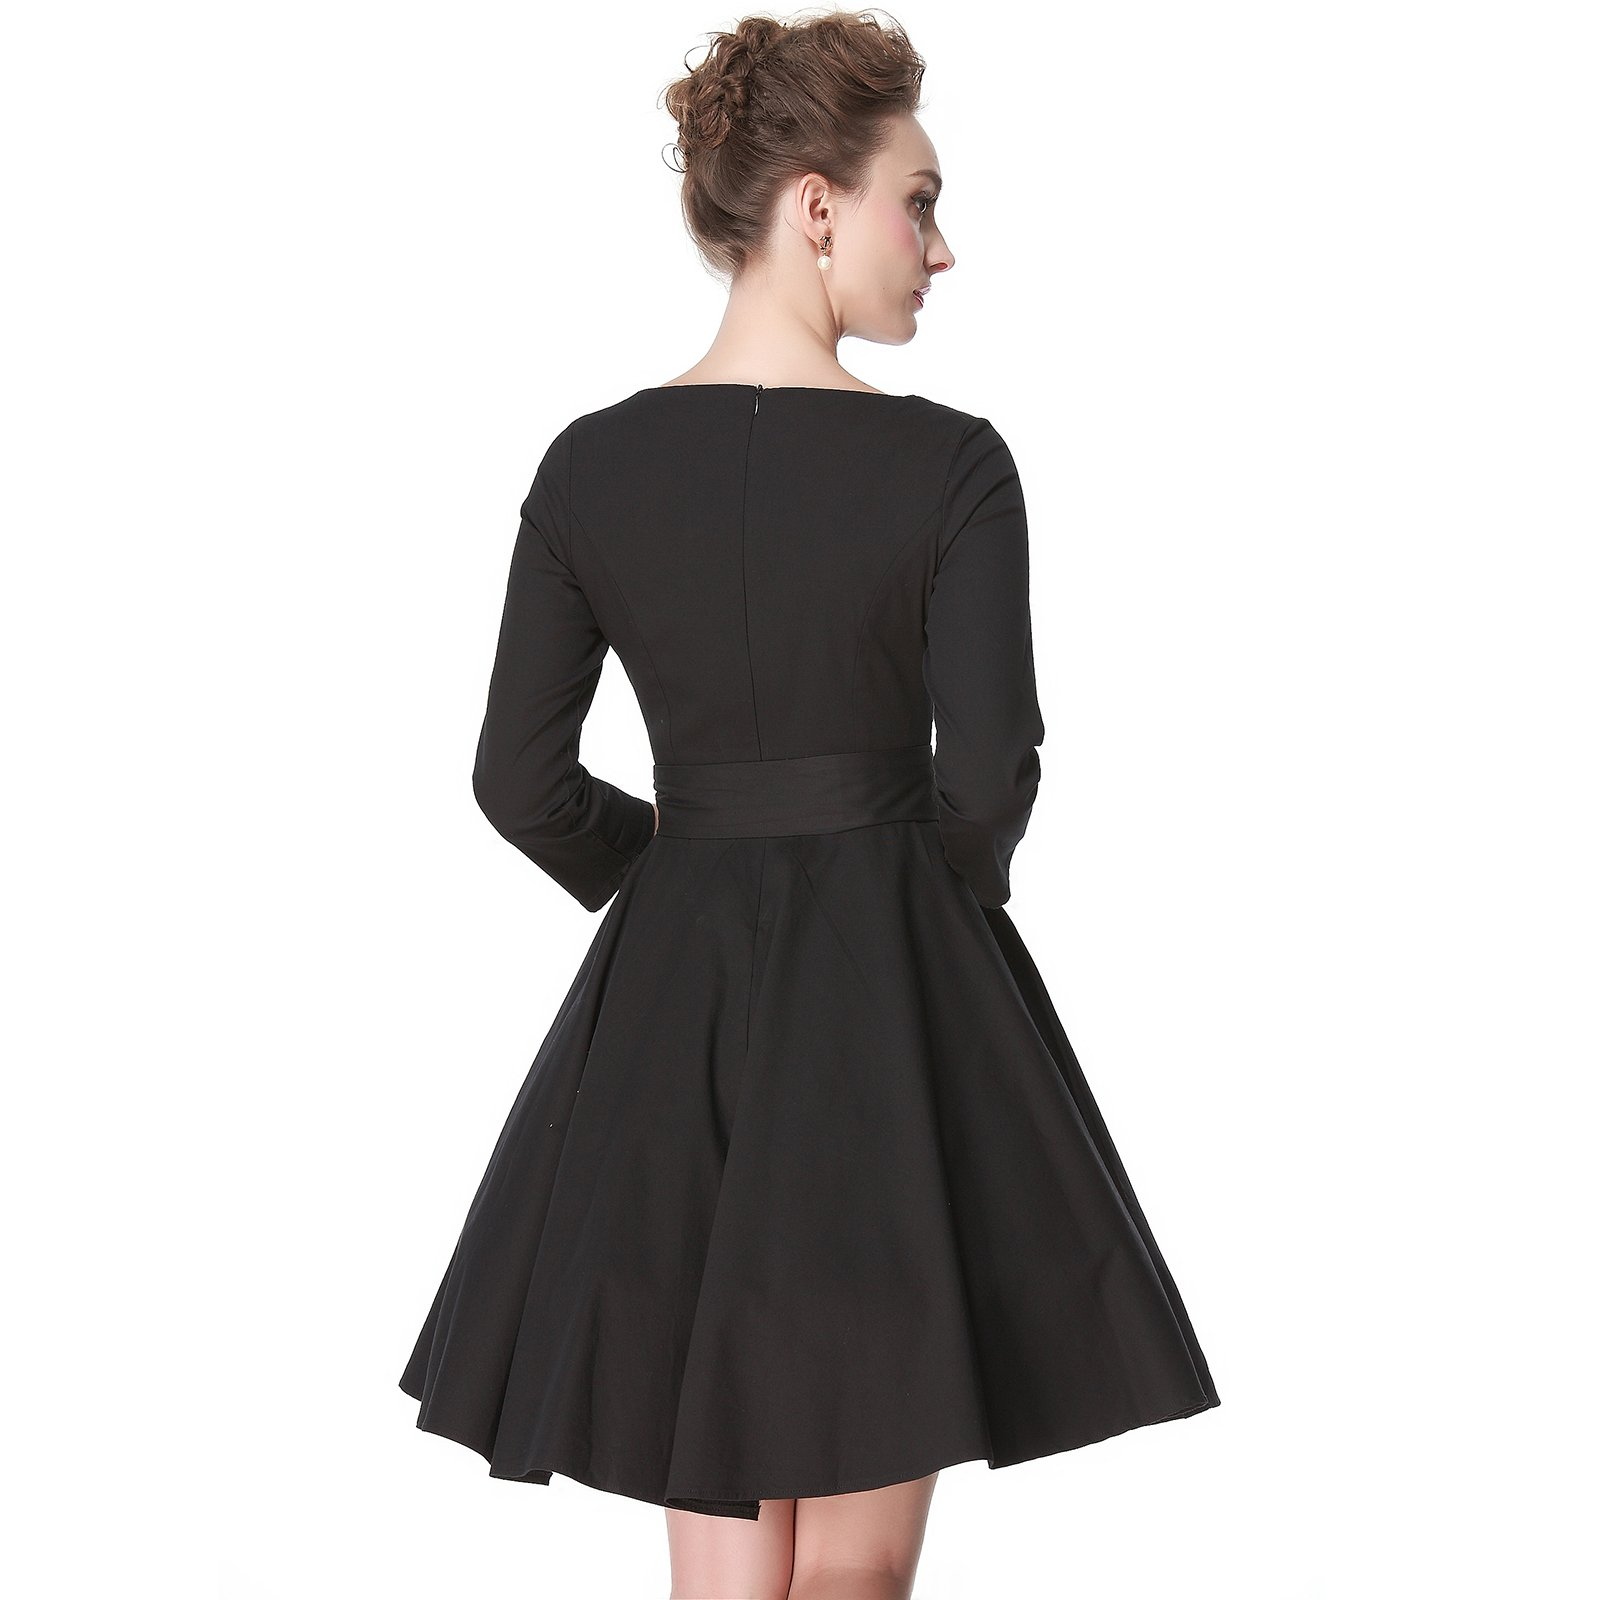 Heroecol 50s 60s Hepburn 3/4 Sleeve Style Vintage Retro Swing Rockailly Dresses Size XL Color Black by Heroecol (Image #2)